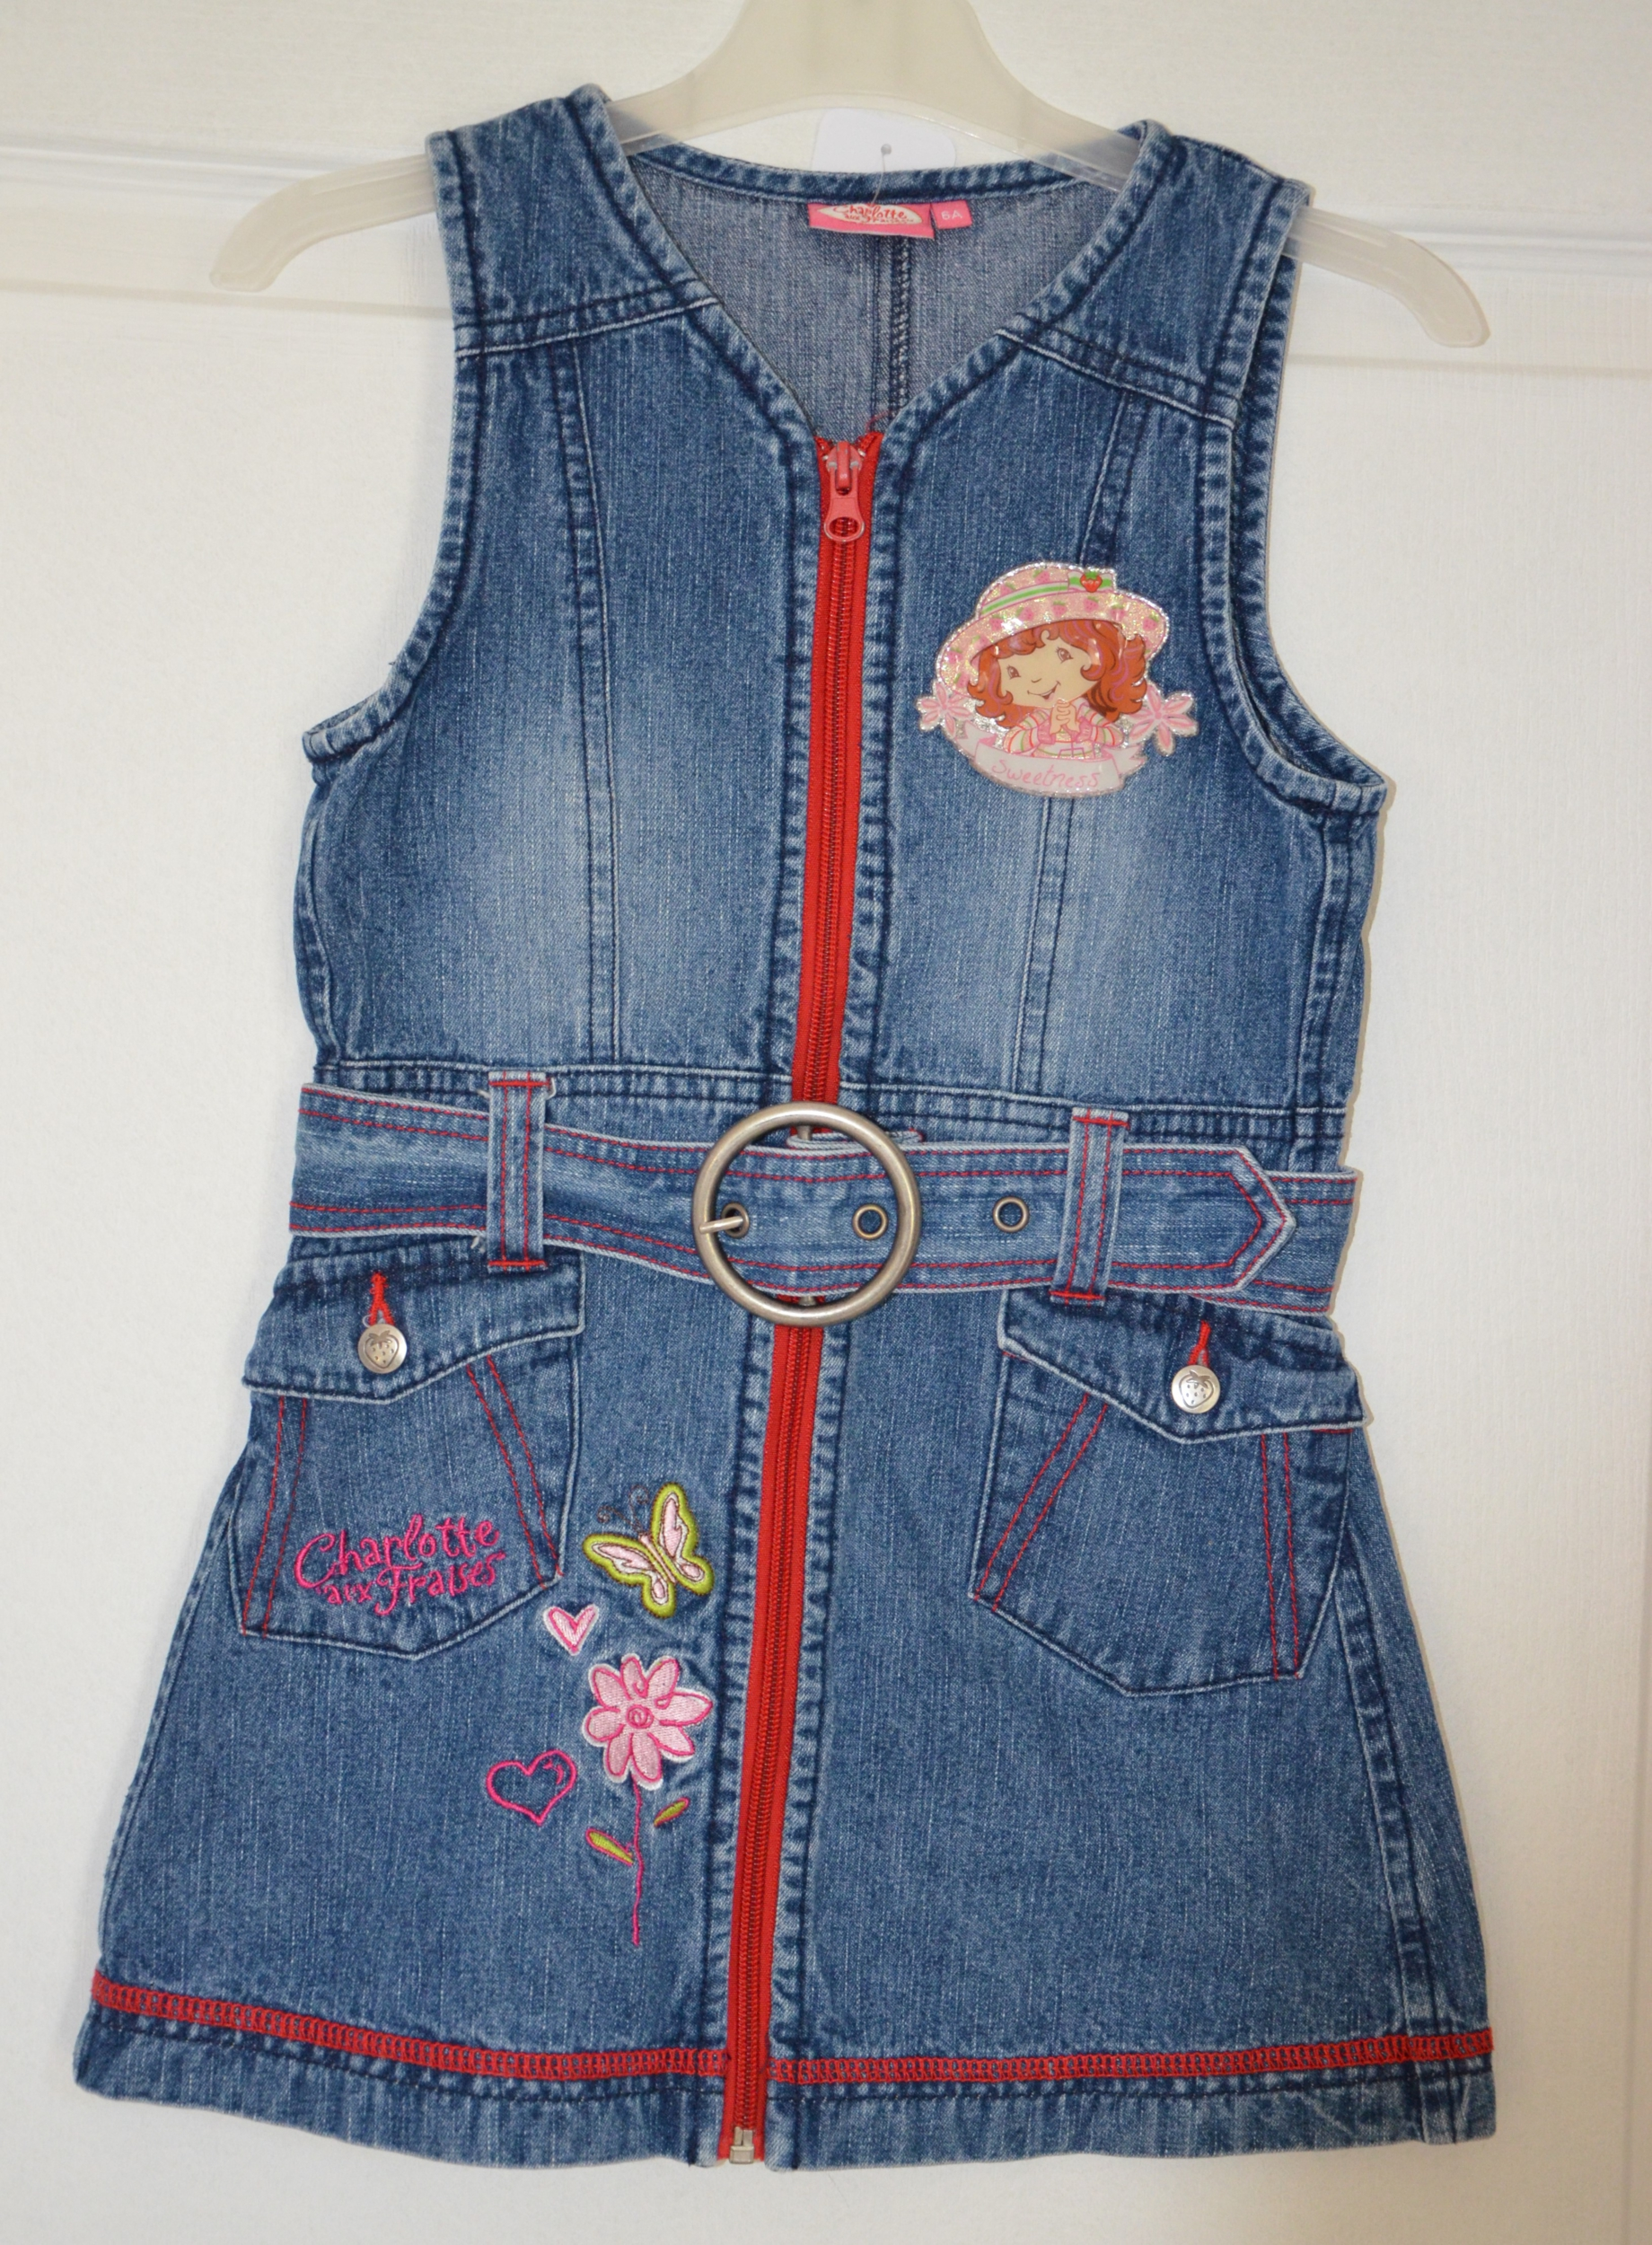 robe jean bleu bretelles charlotte aux fraises fille 6 ans charlotte aux fraises